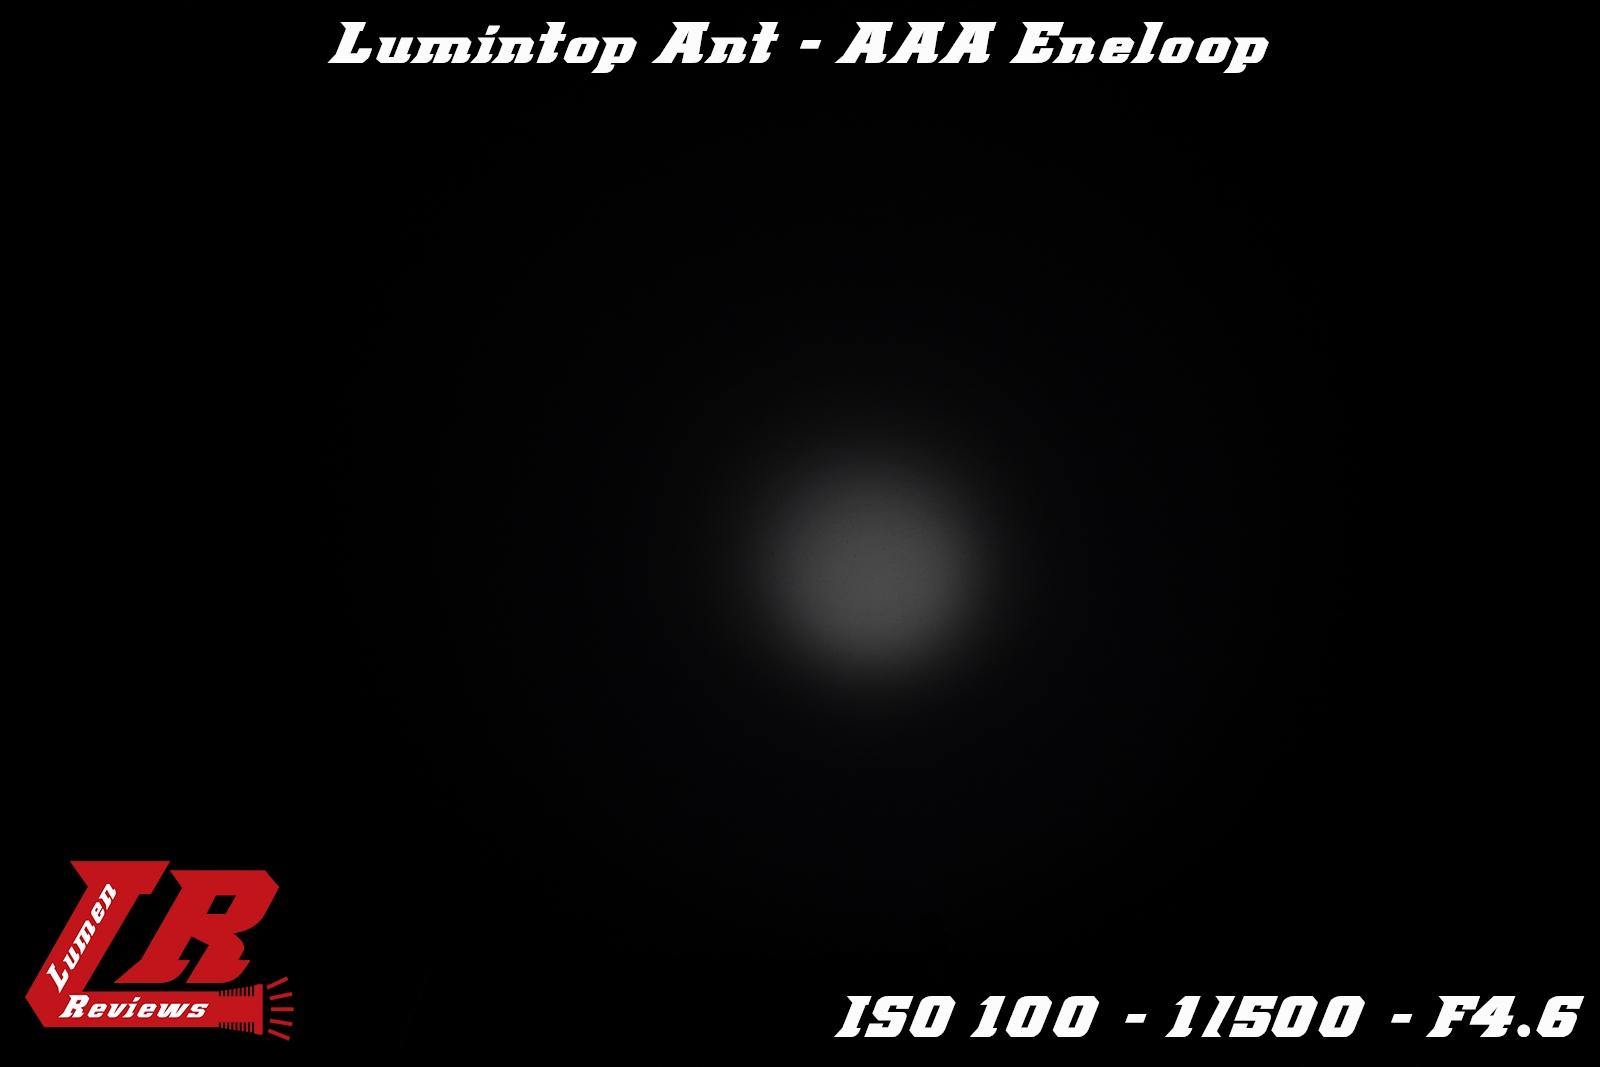 Lumintop Ant 29